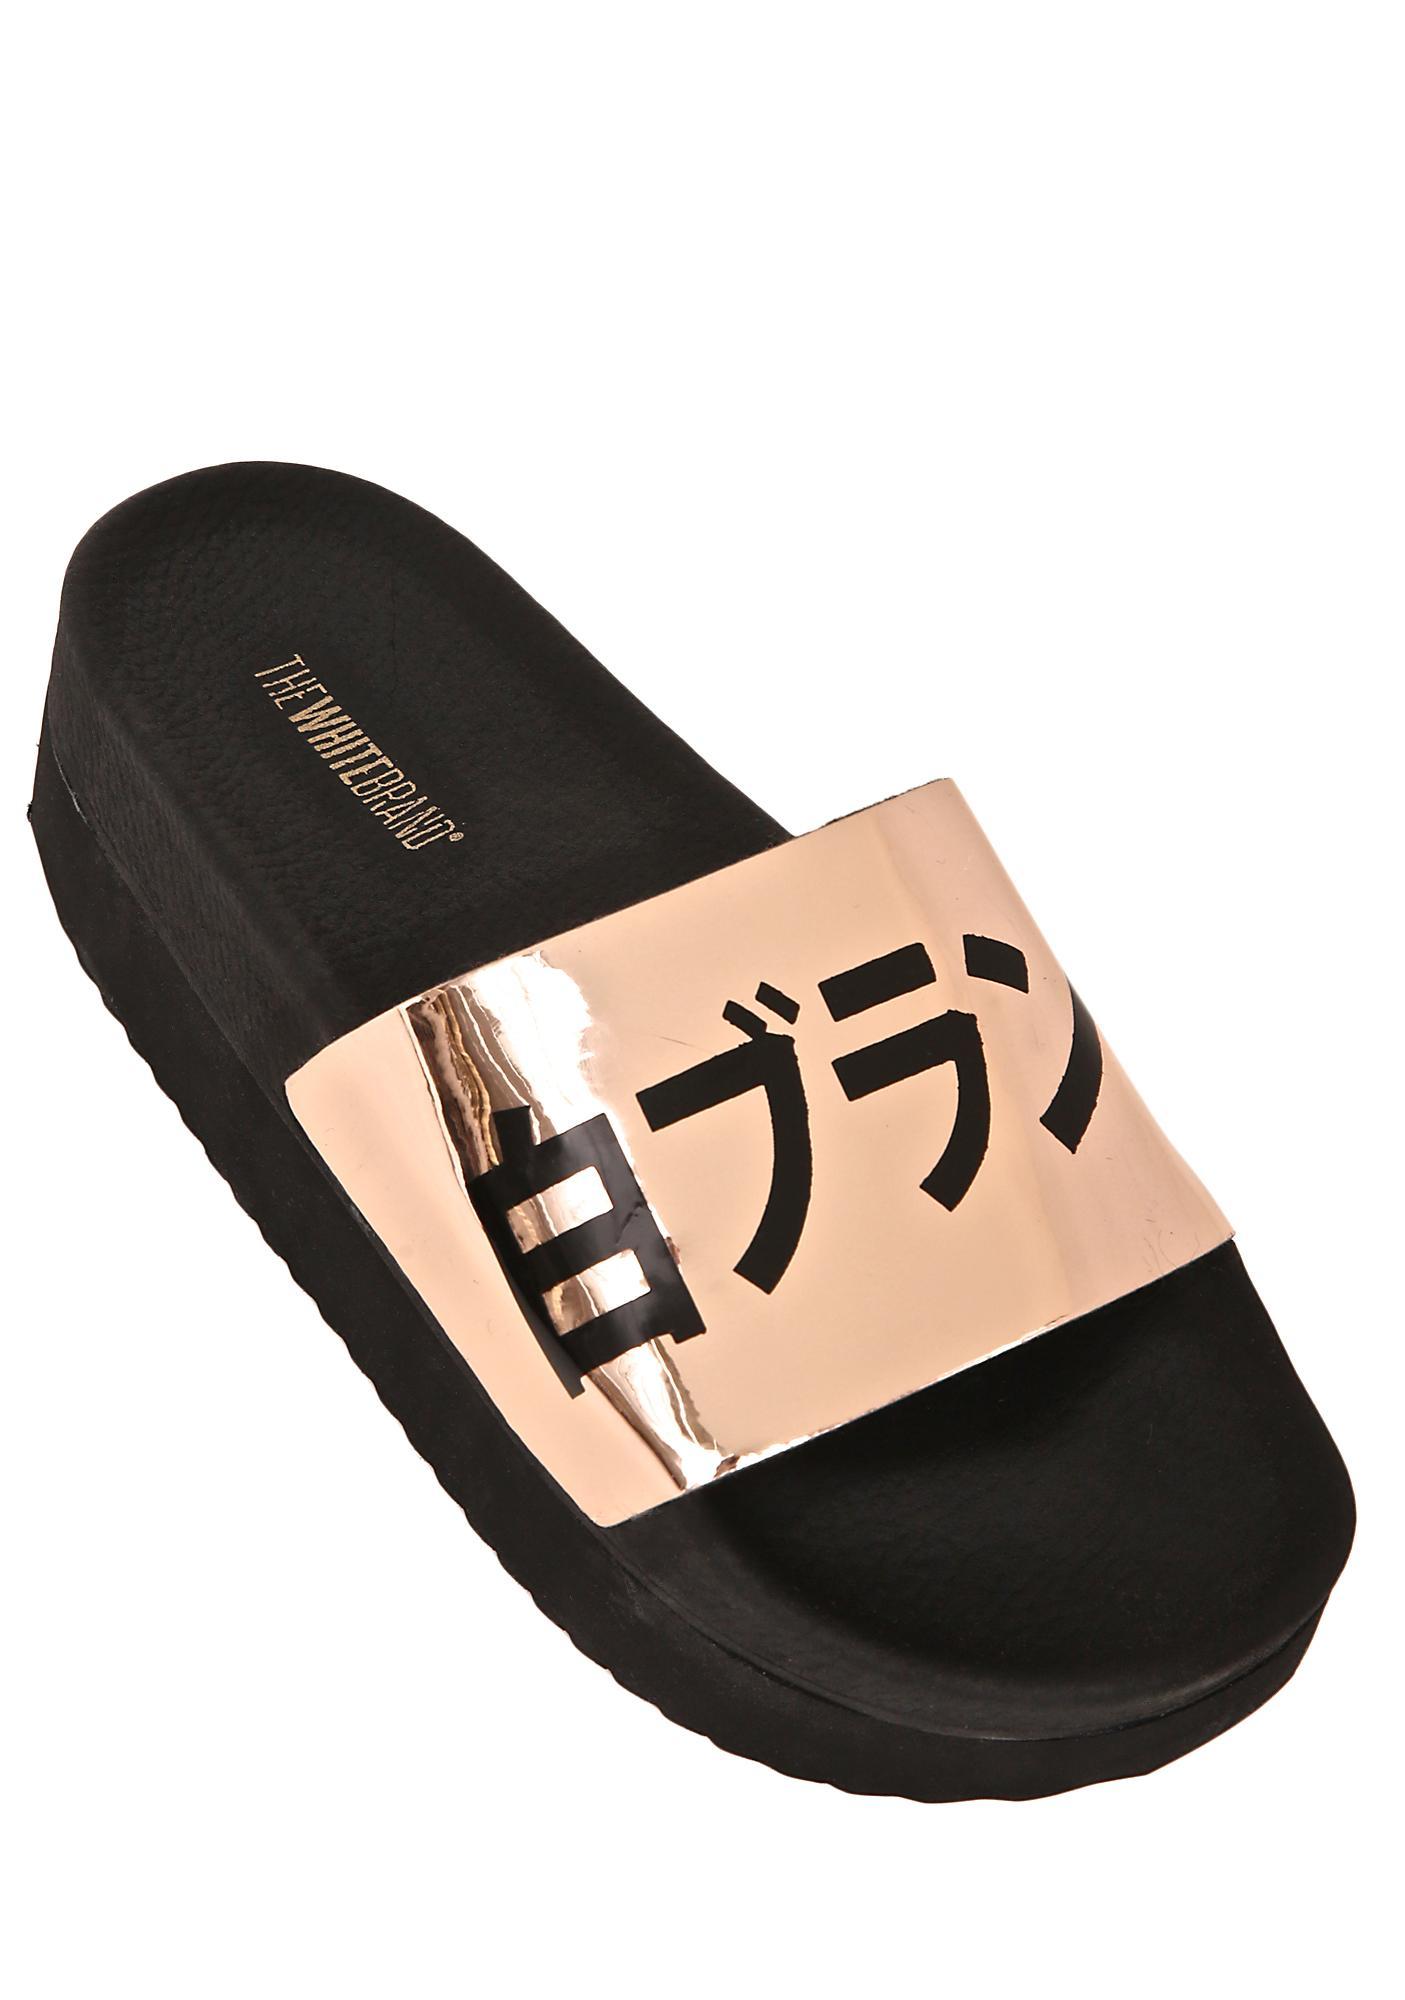 The White Brand High Japan Metallic Slides